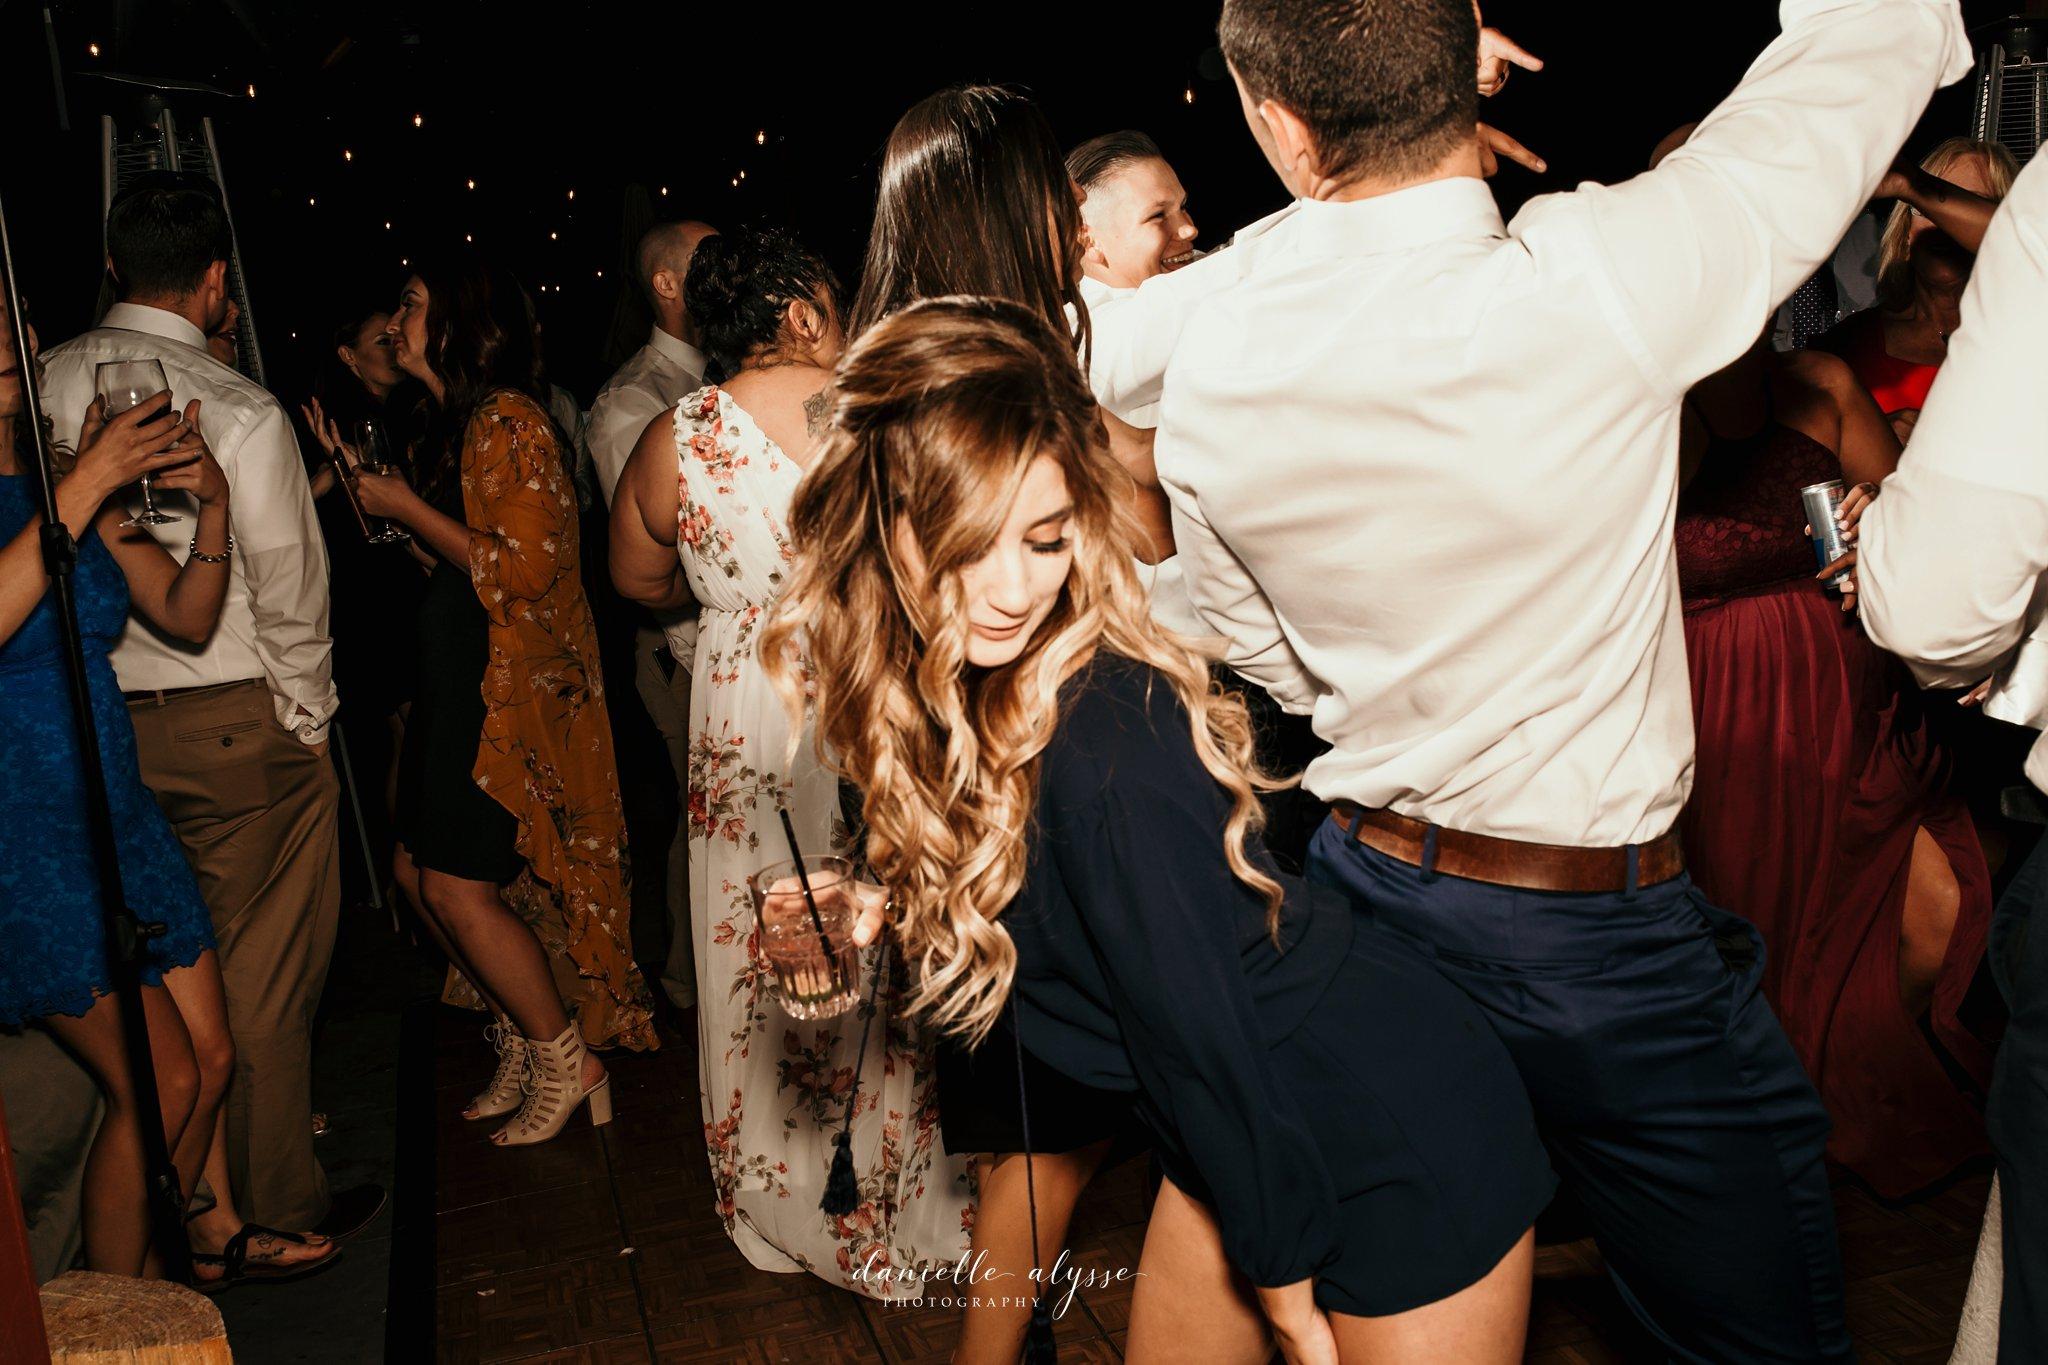 180831_wedding_stephanie_heavenly_south_lake_tahoe_danielle_alysse_photography_destination_blog_1241_WEB.jpg